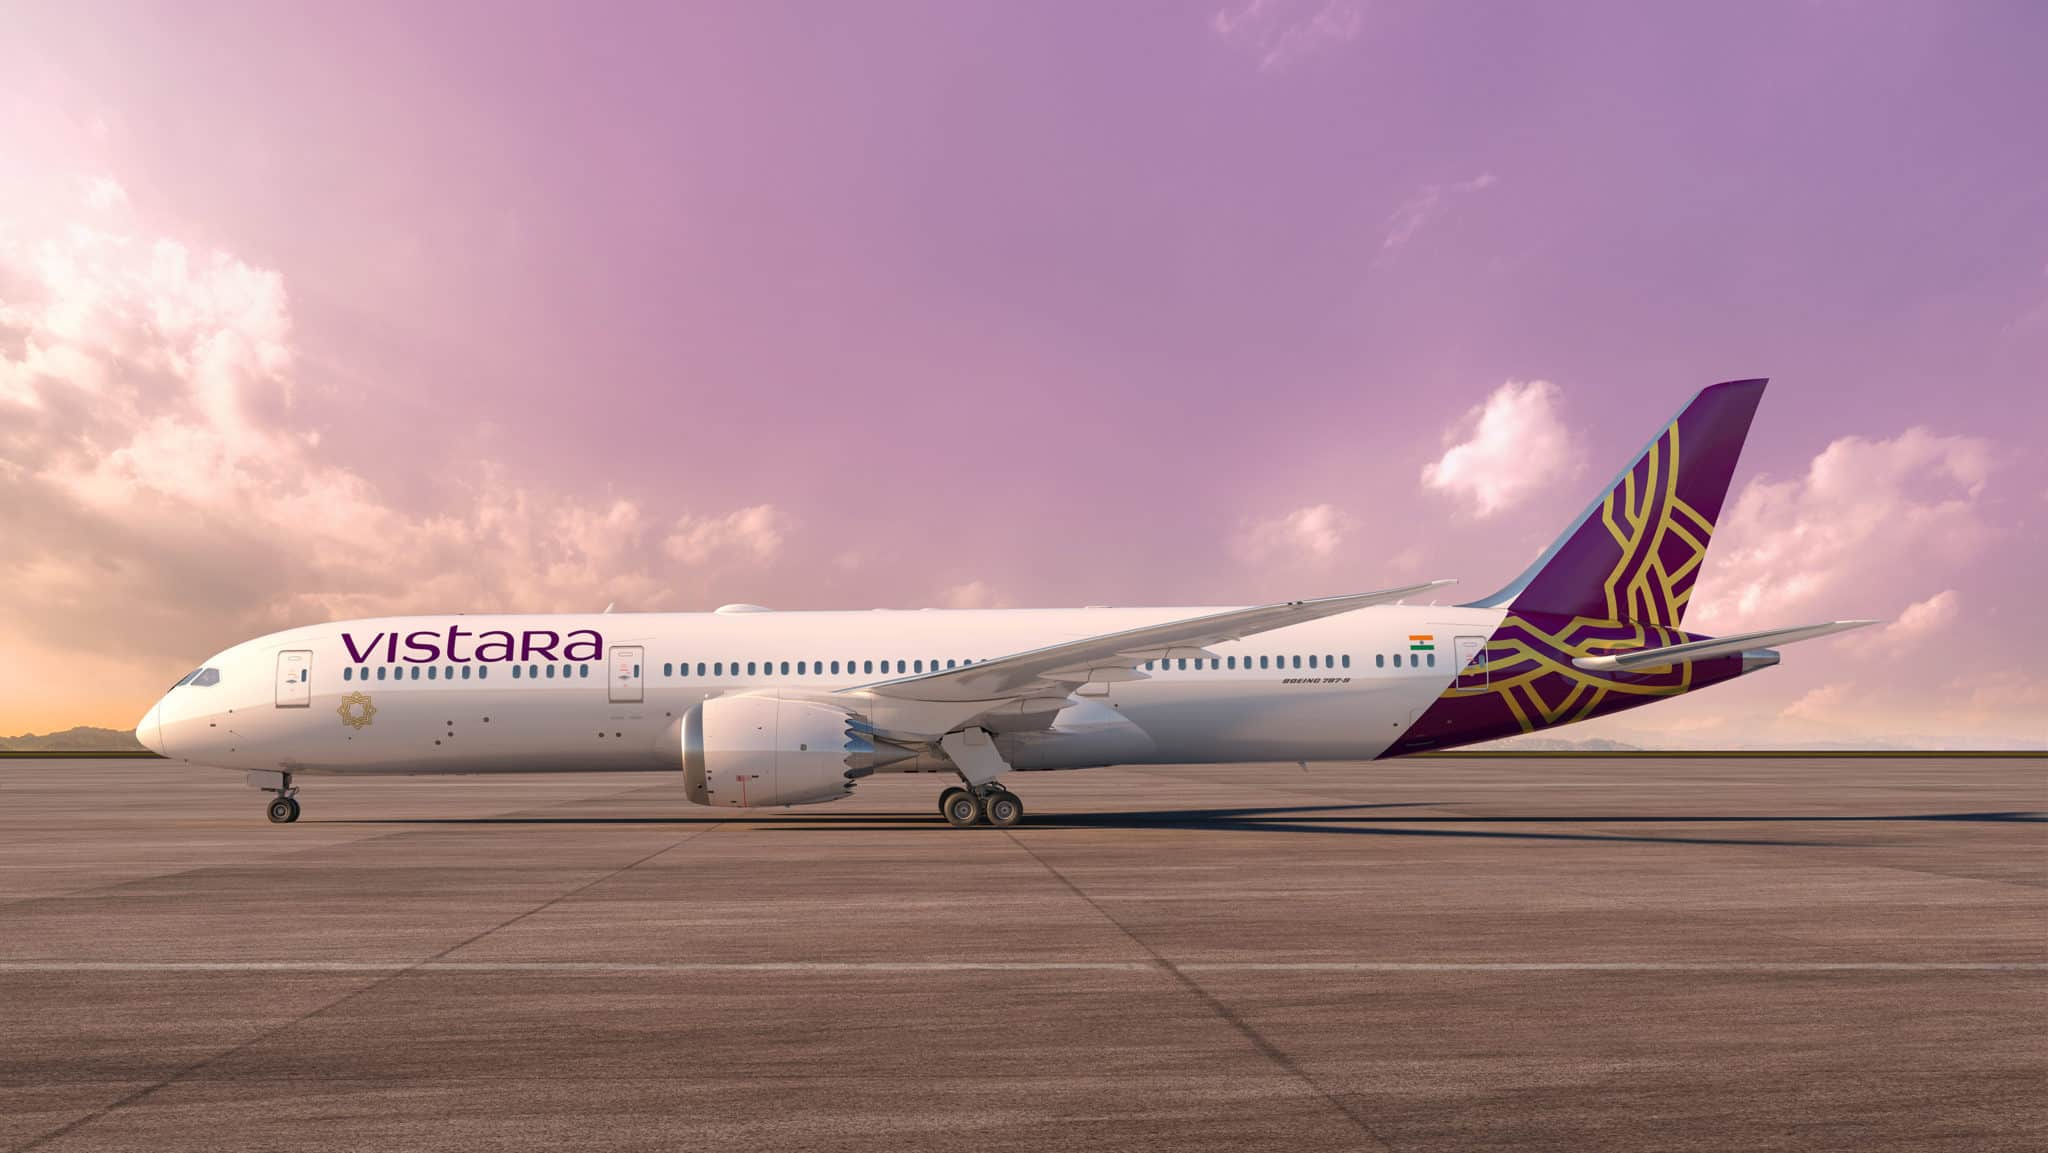 Vistara keen to start direct flights to the US